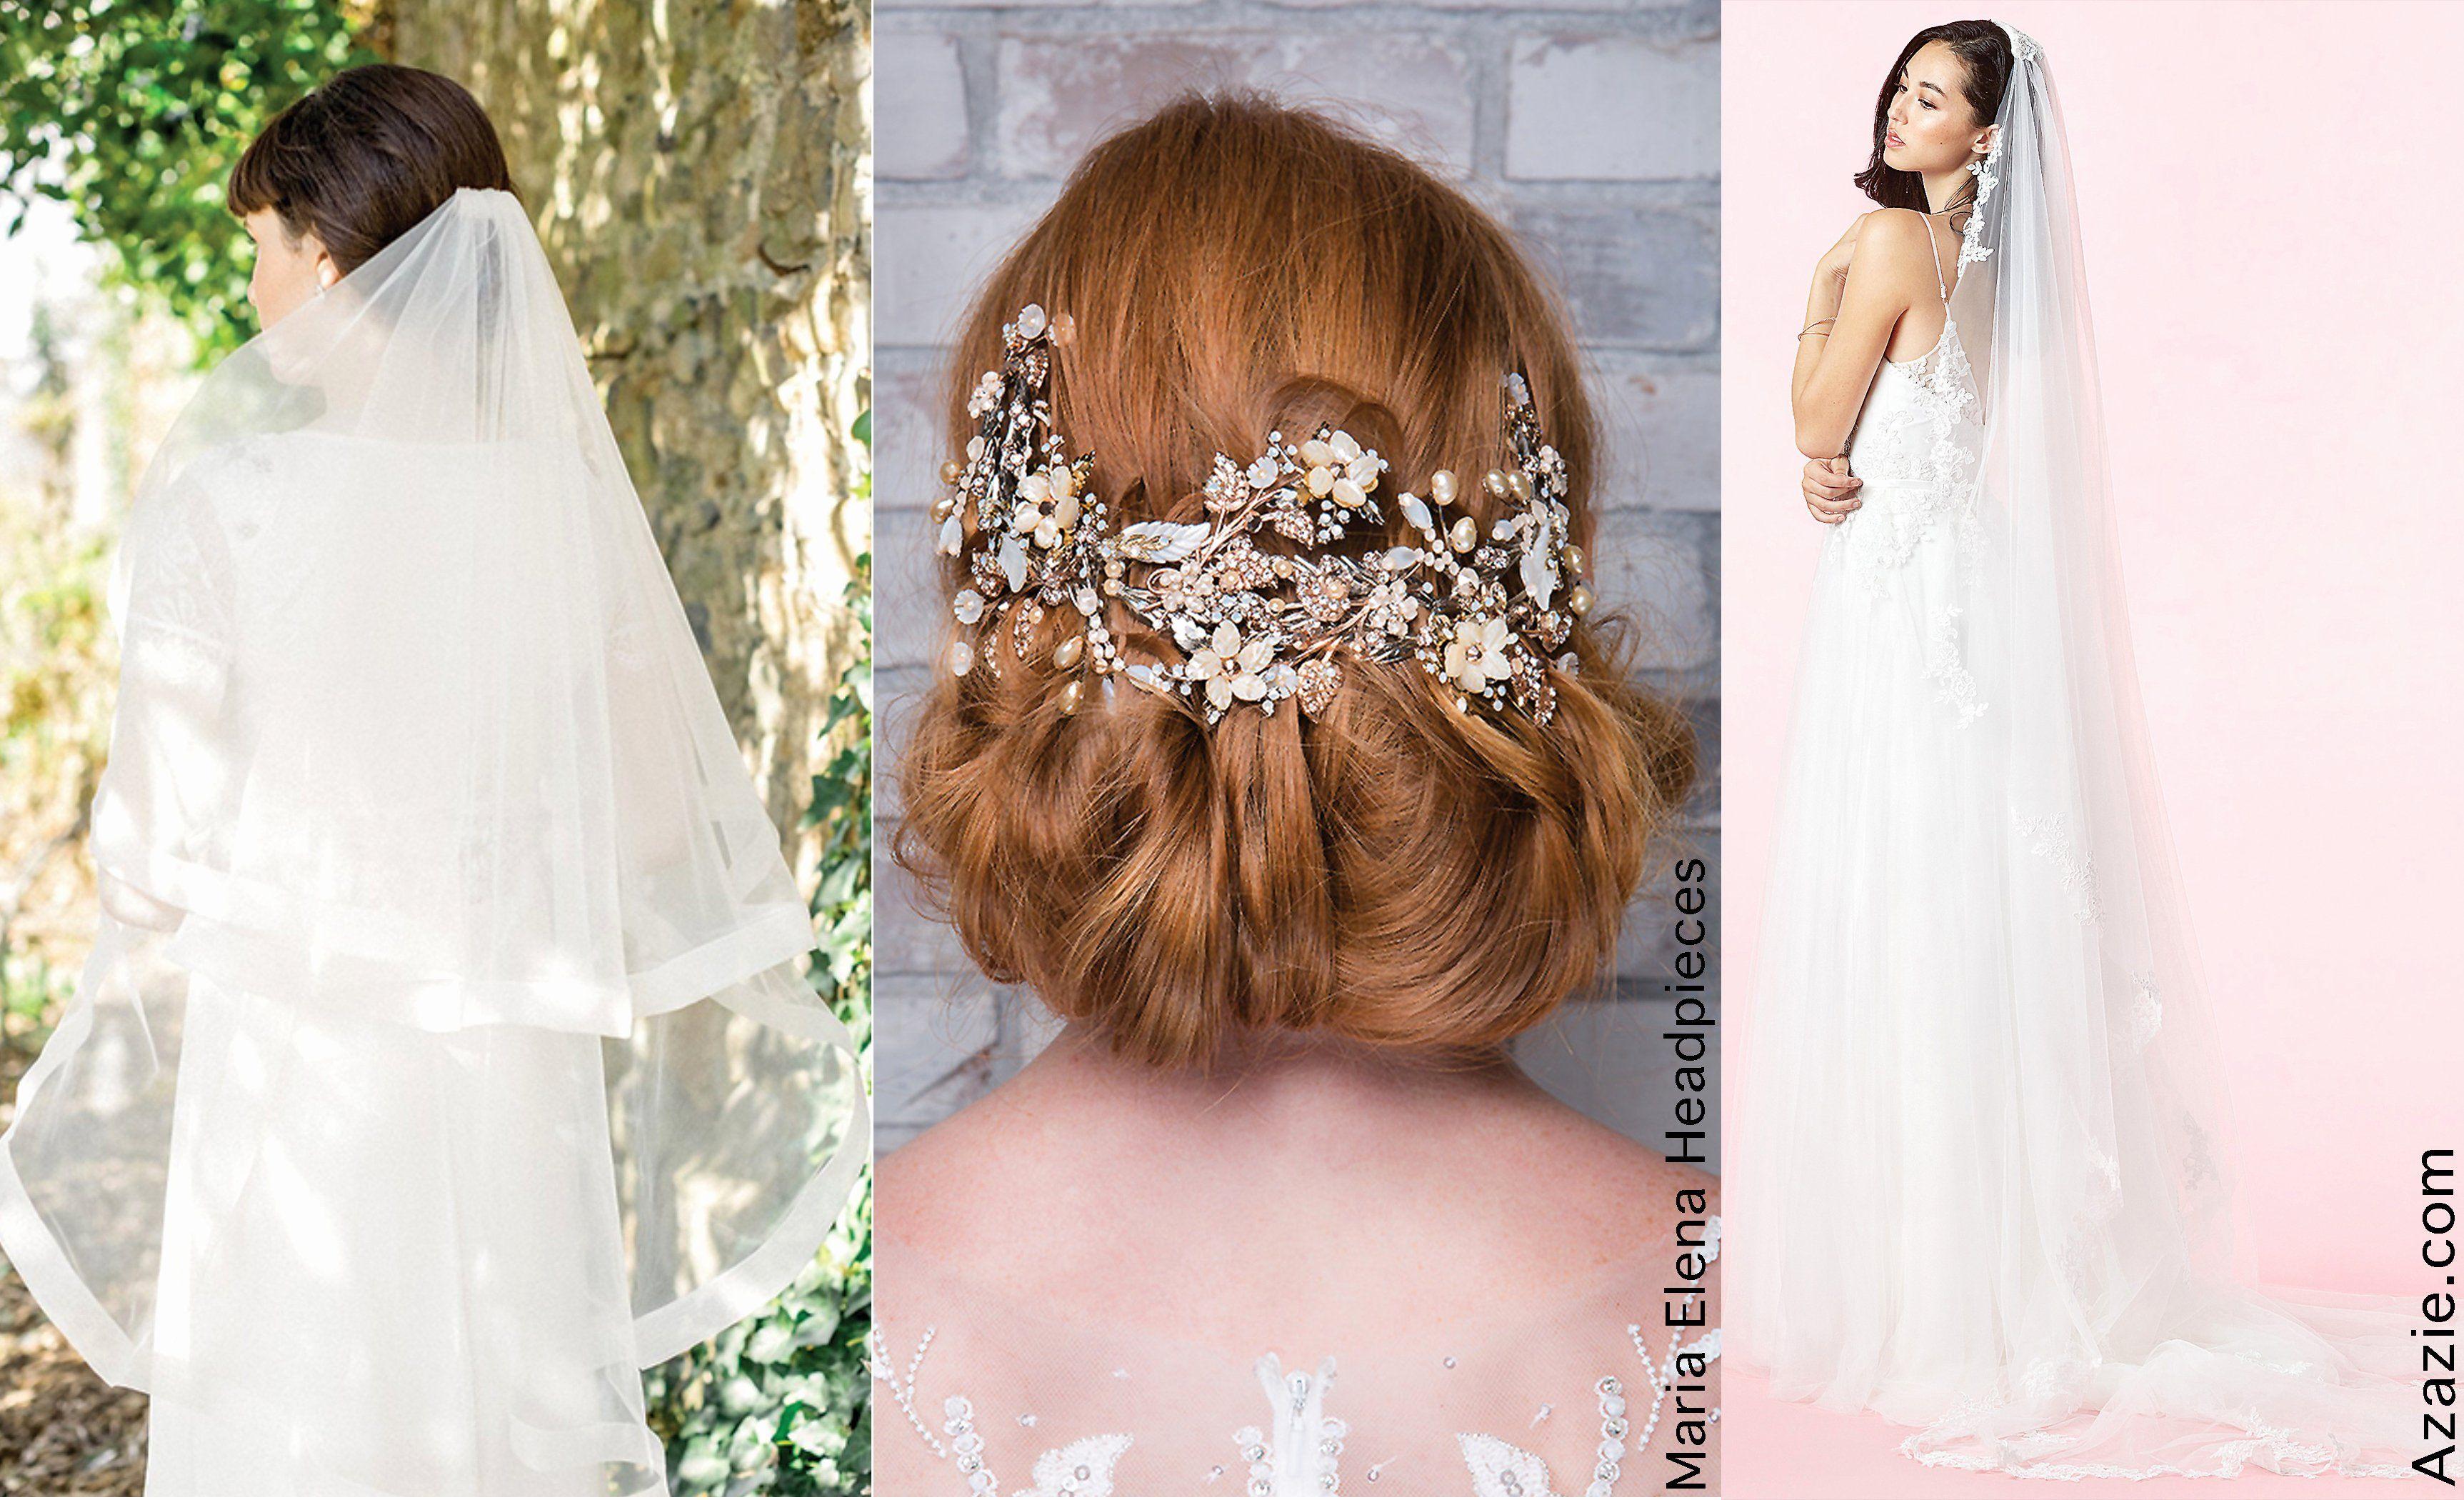 Las Vegas Wedding Dress Rentals Inspirational Latino Bride And Groom In 2020 Vegas Wedding Dress Rental Wedding Dresses Mexican Themed Weddings